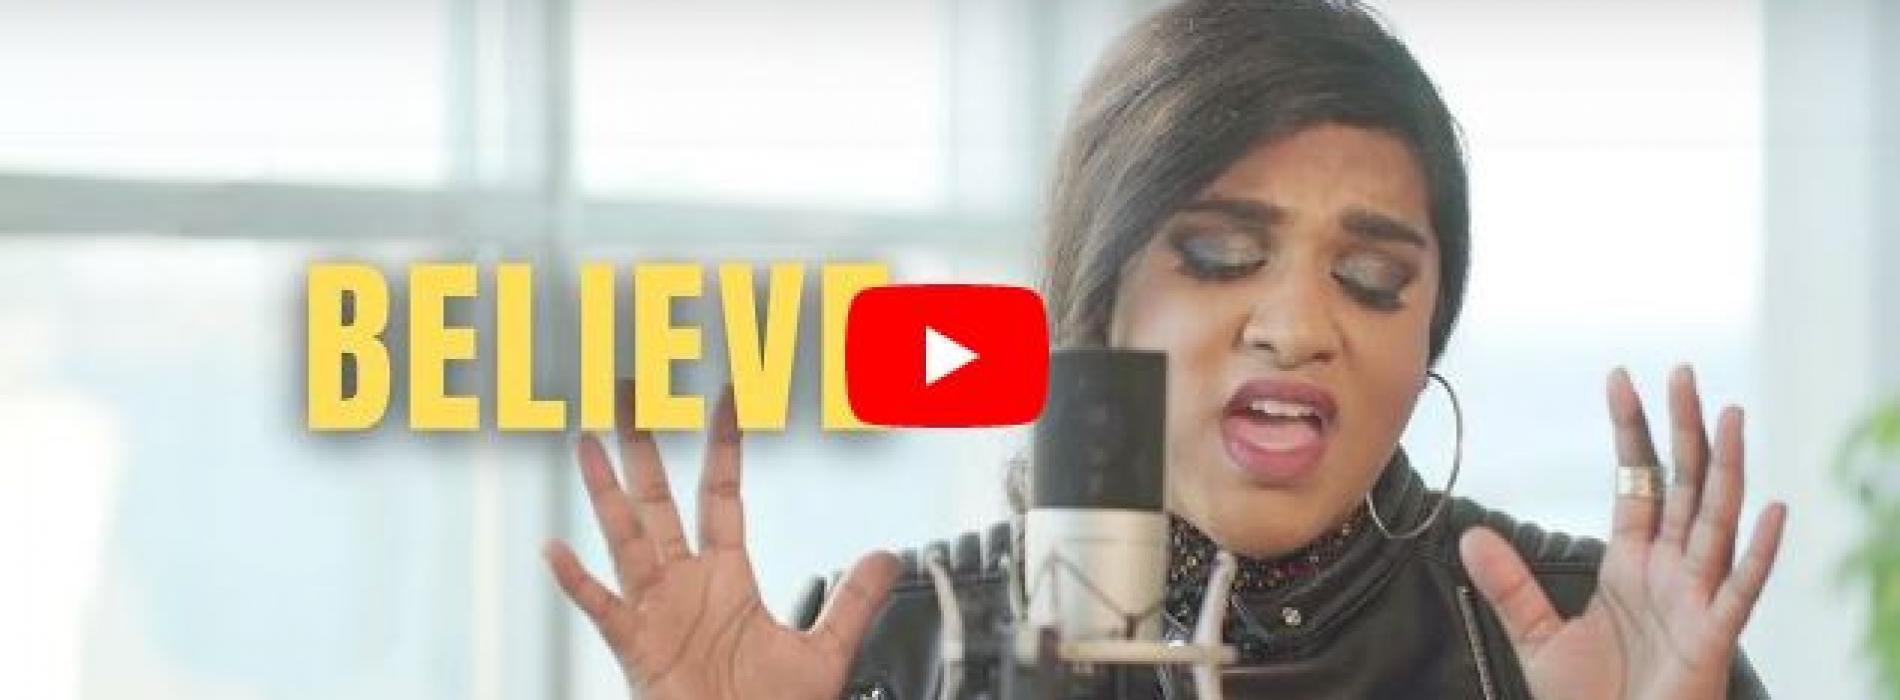 New Music : Believe – Cher (Roveena Cover)